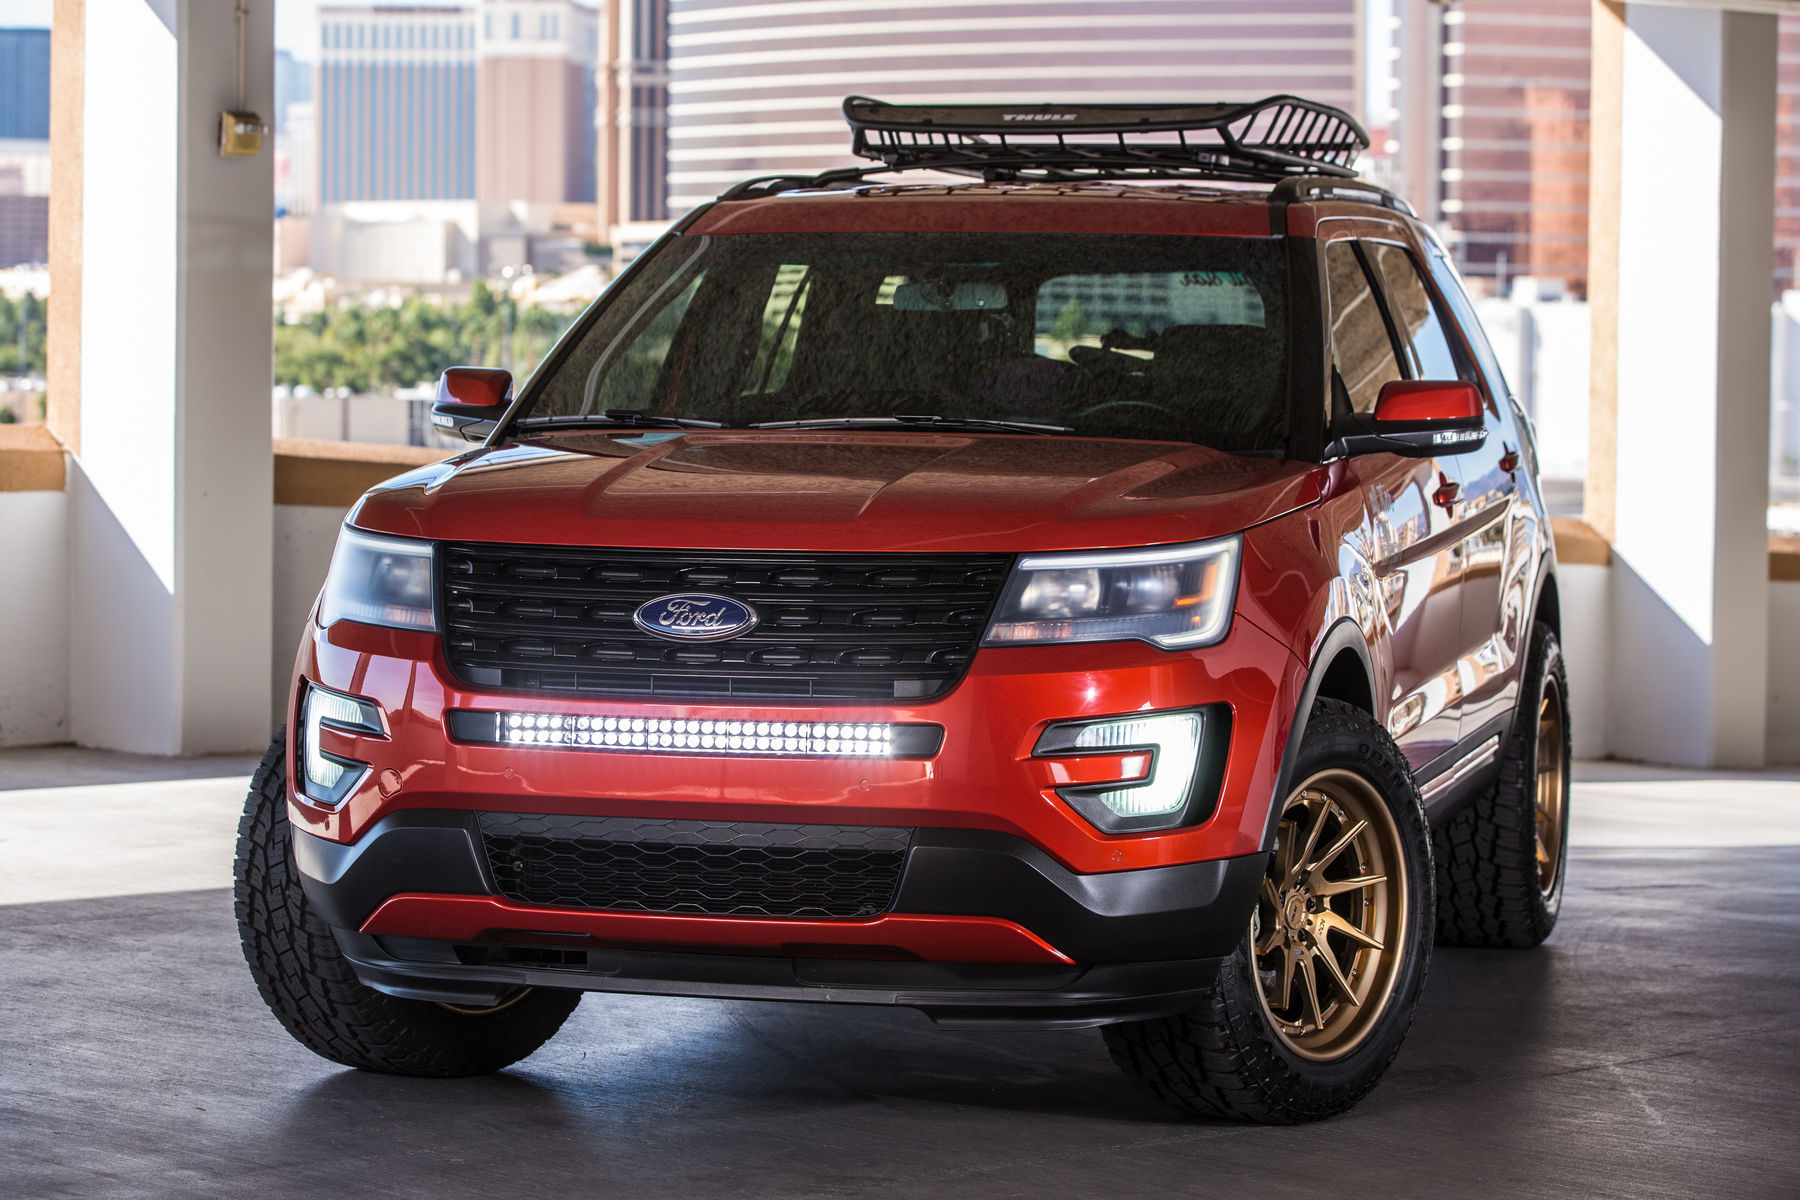 2015 Ford Explorer Sport | 2015 All Star Ford Explorer Sport - Front Pro Shot